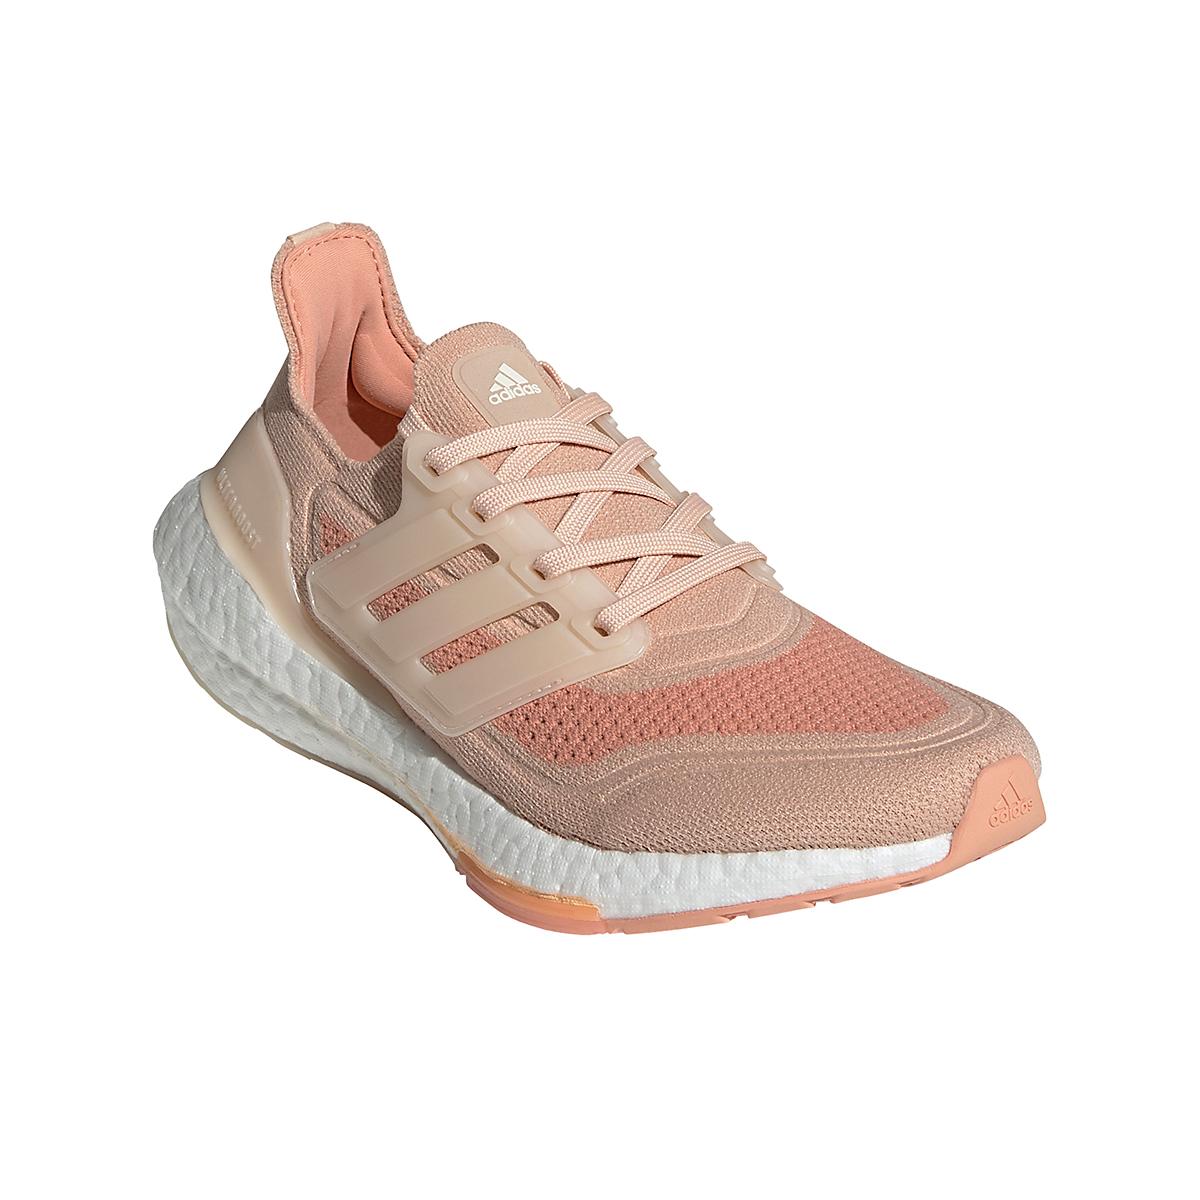 Women's Adidas Ultraboost 21 Running Shoe - Color: Halo Blush/Wonder White/Ambient Blush - Size: 5 - Width: Regular, Halo Blush/Wonder White/Ambient Blush, large, image 3